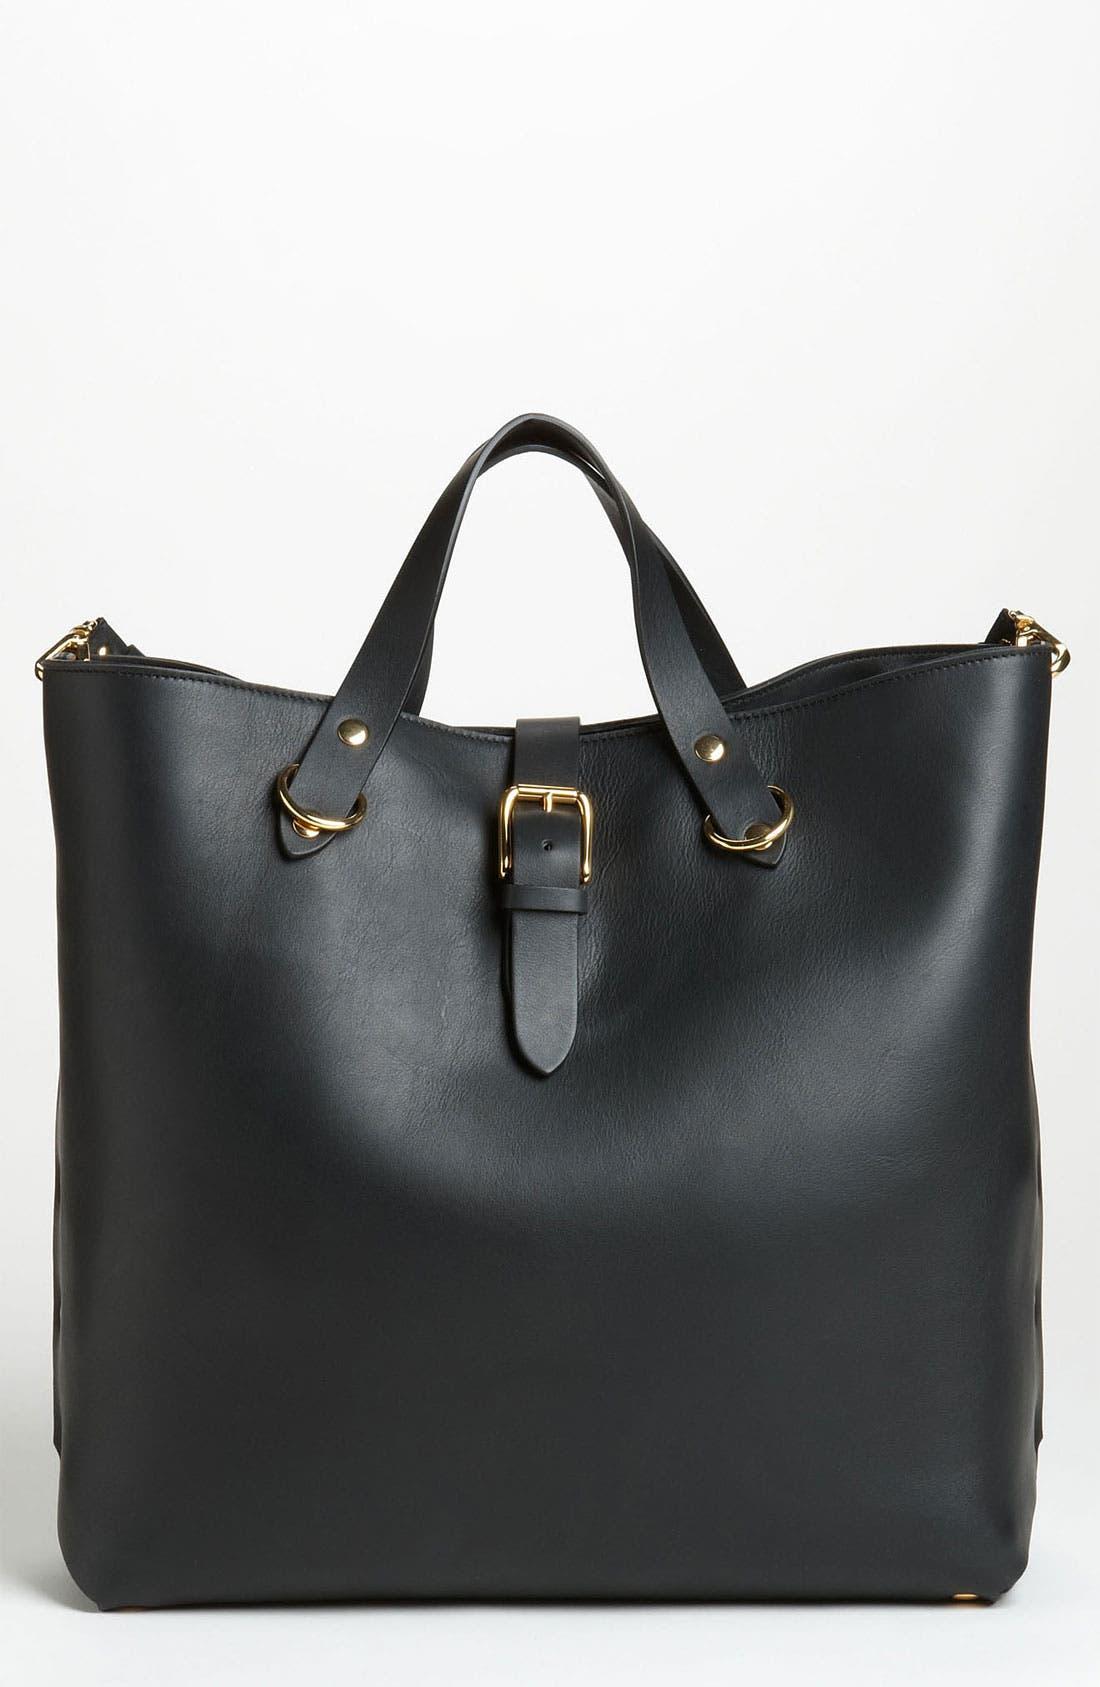 Alternate Image 1 Selected - Marni 'Large' Studded Leather Tote